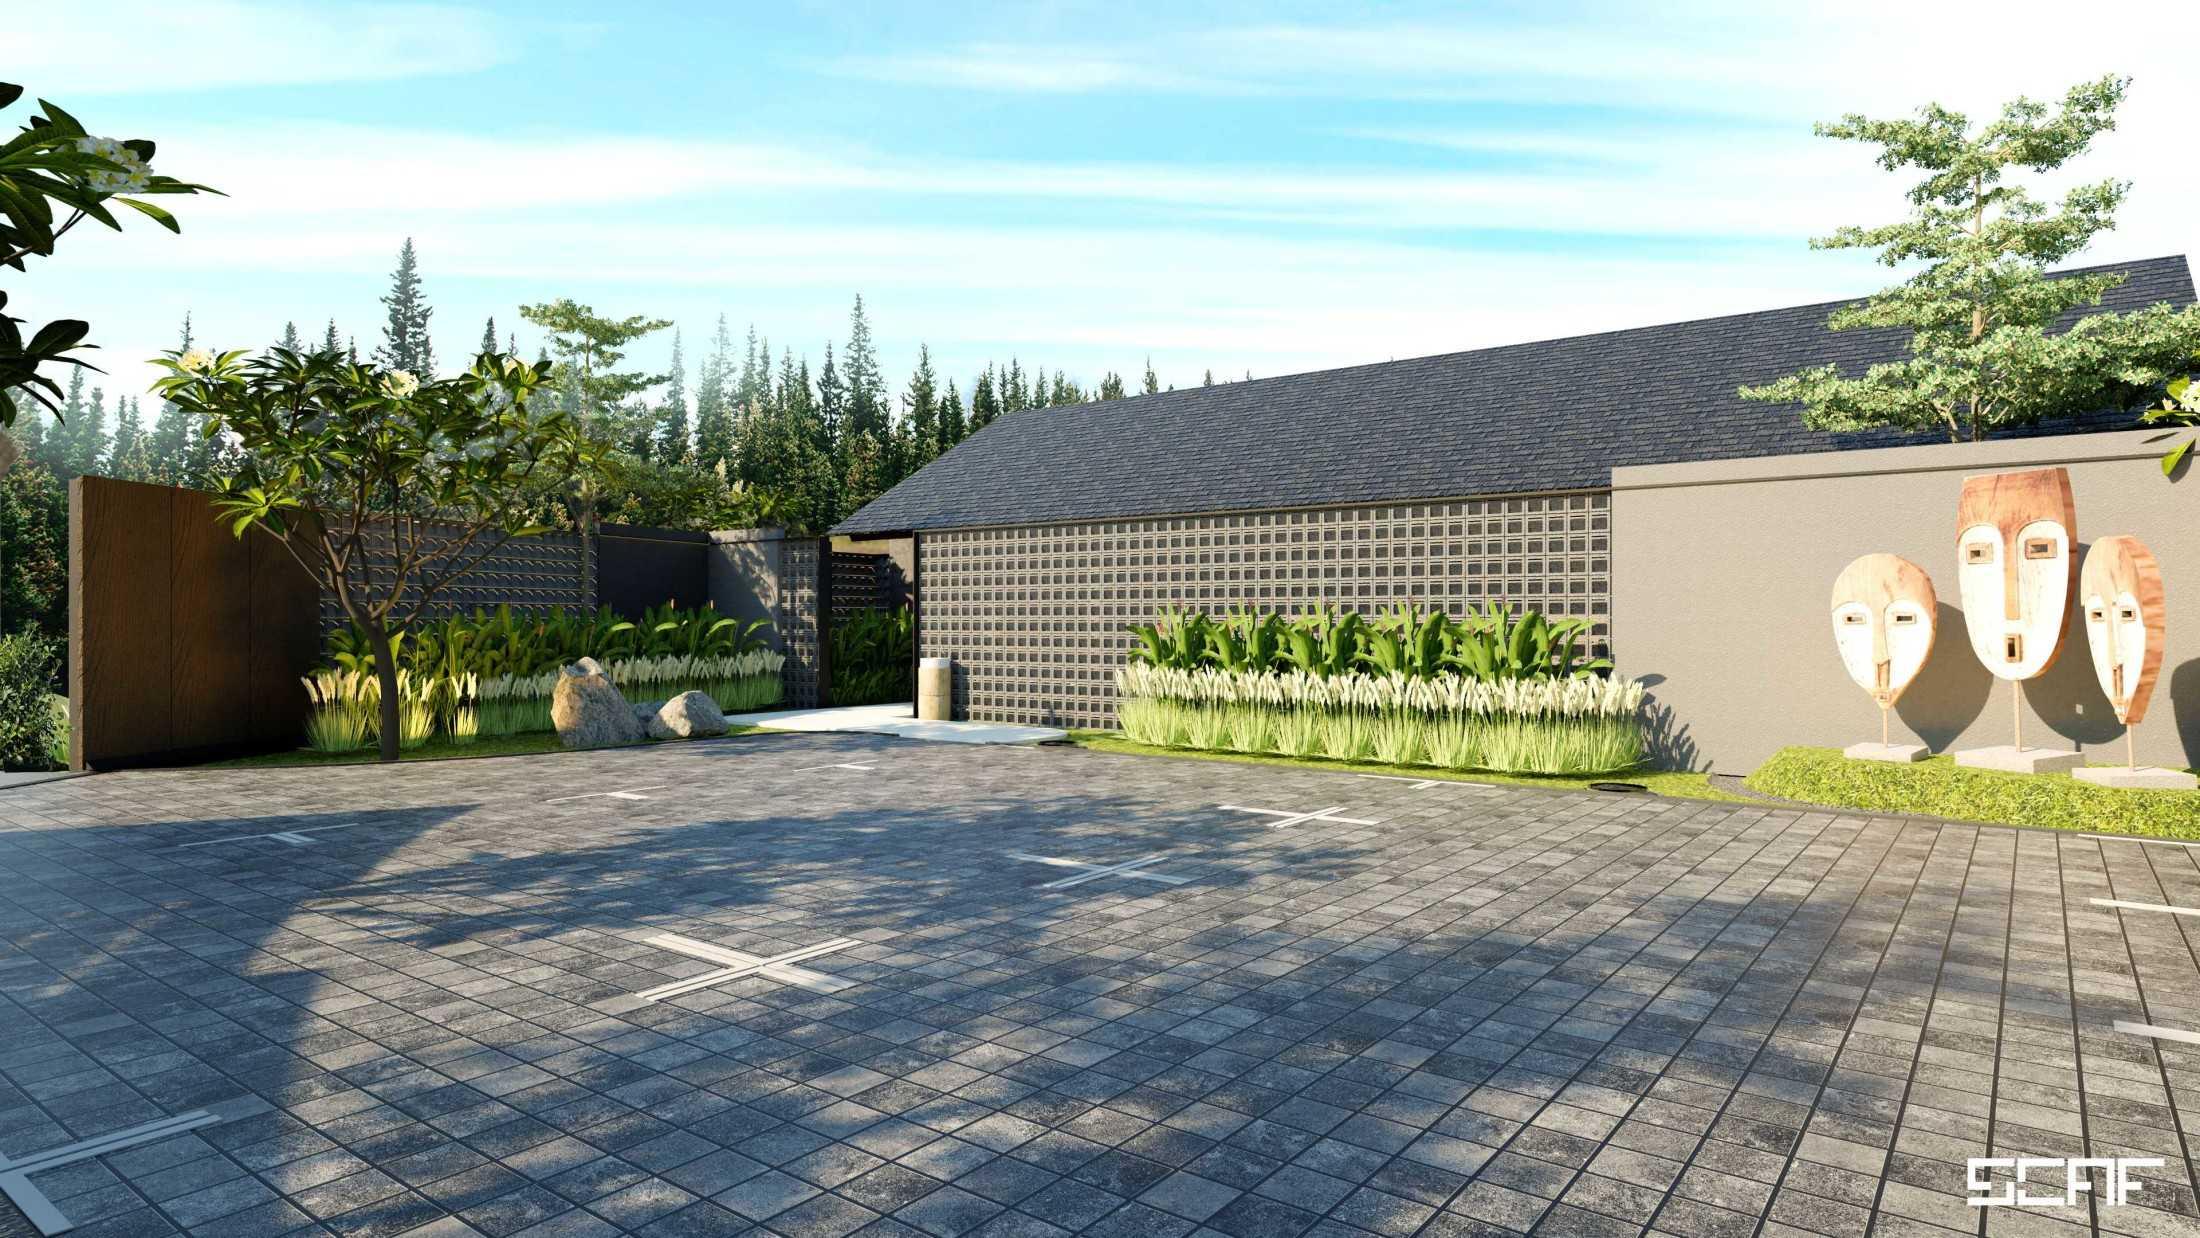 Scaf Studio Villa Rayung Cisarua, Kec. Cisarua, Bogor, Jawa Barat, Indonesia Cisarua, Kec. Cisarua, Bogor, Jawa Barat, Indonesia Scaf-Studio-Villa-Rayung  121760